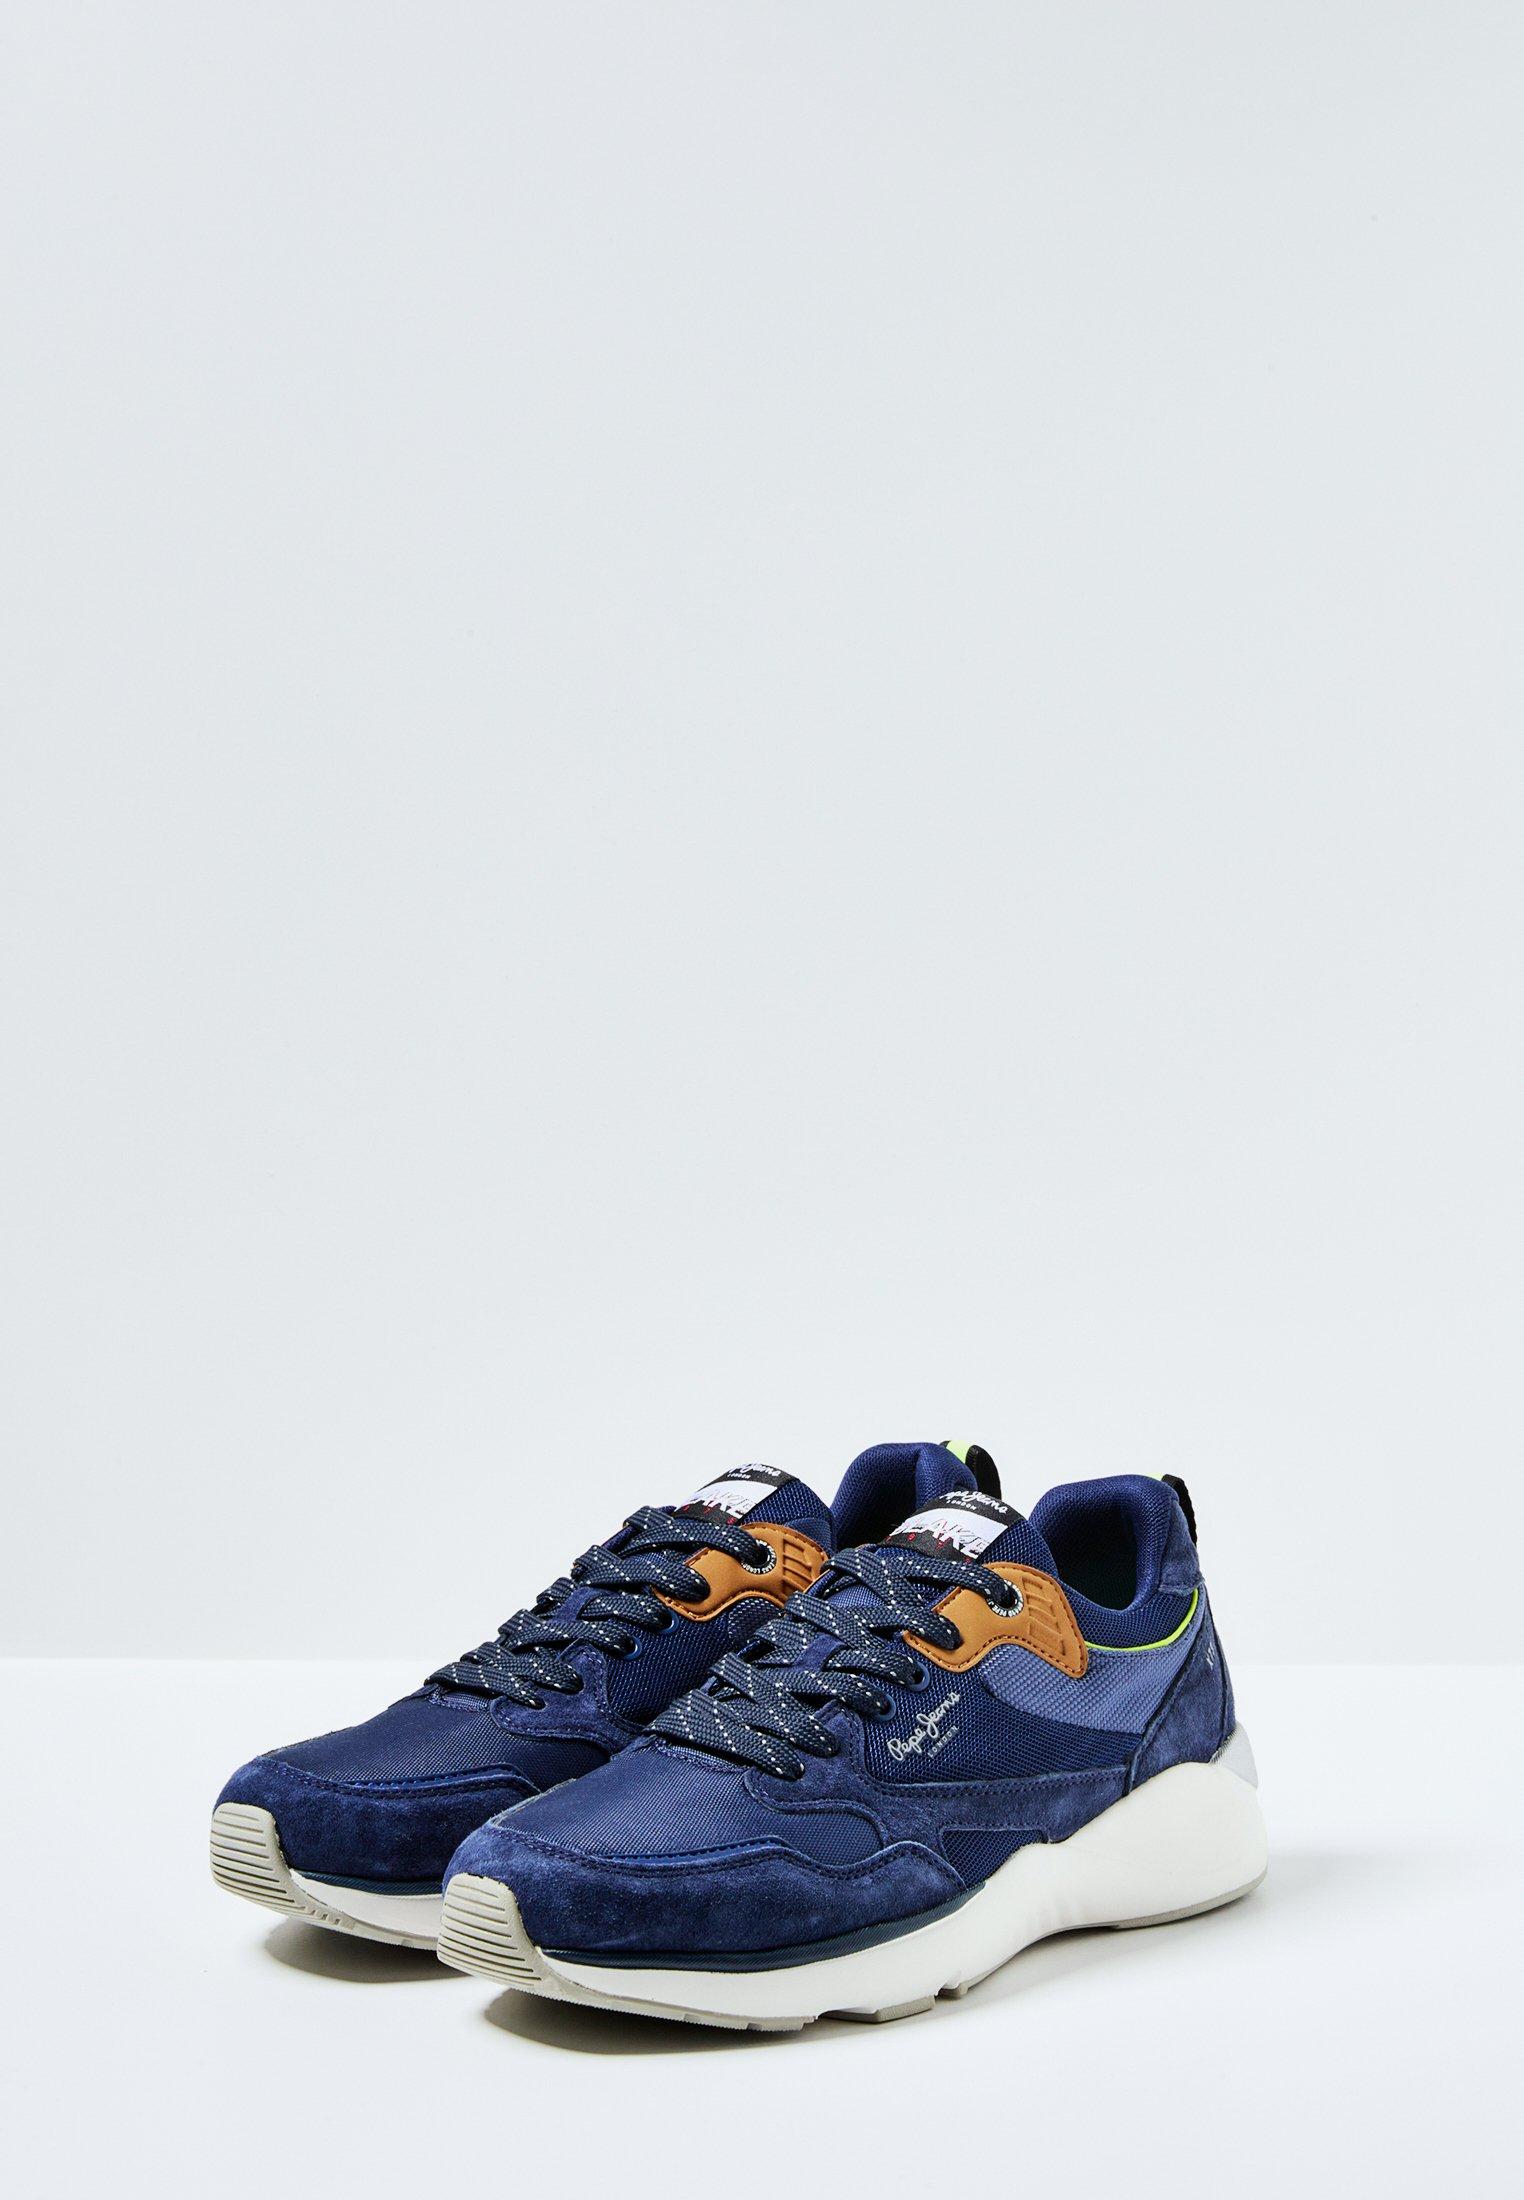 Pepe Jeans Sneaker low - azul marino/dunkelblau - Herrenschuhe o2hee